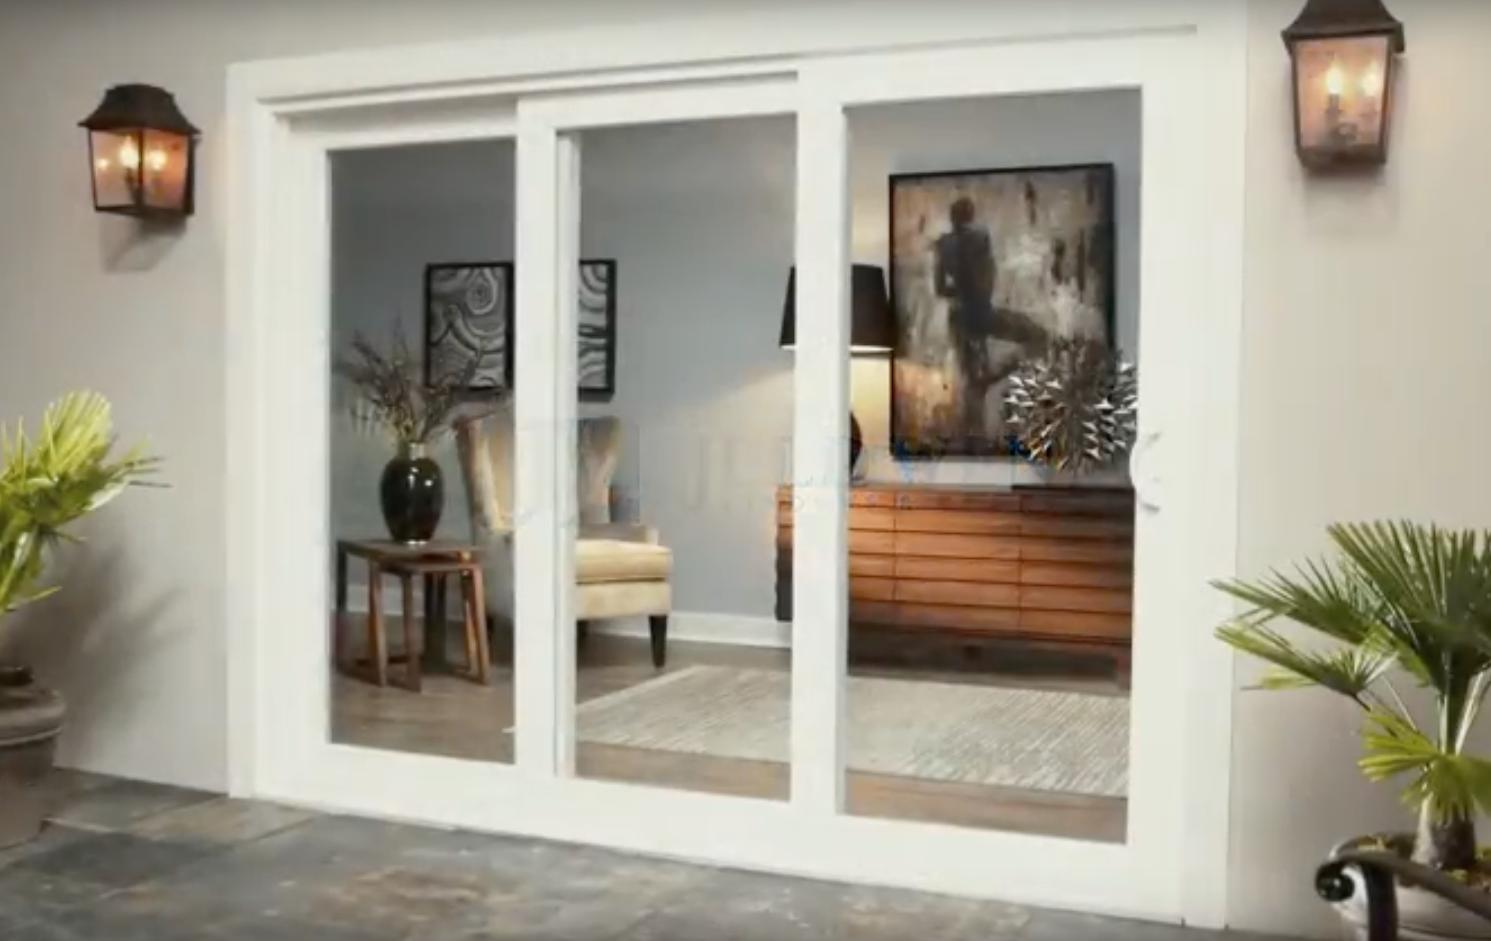 How To Install a Multi-Slide Patio Door